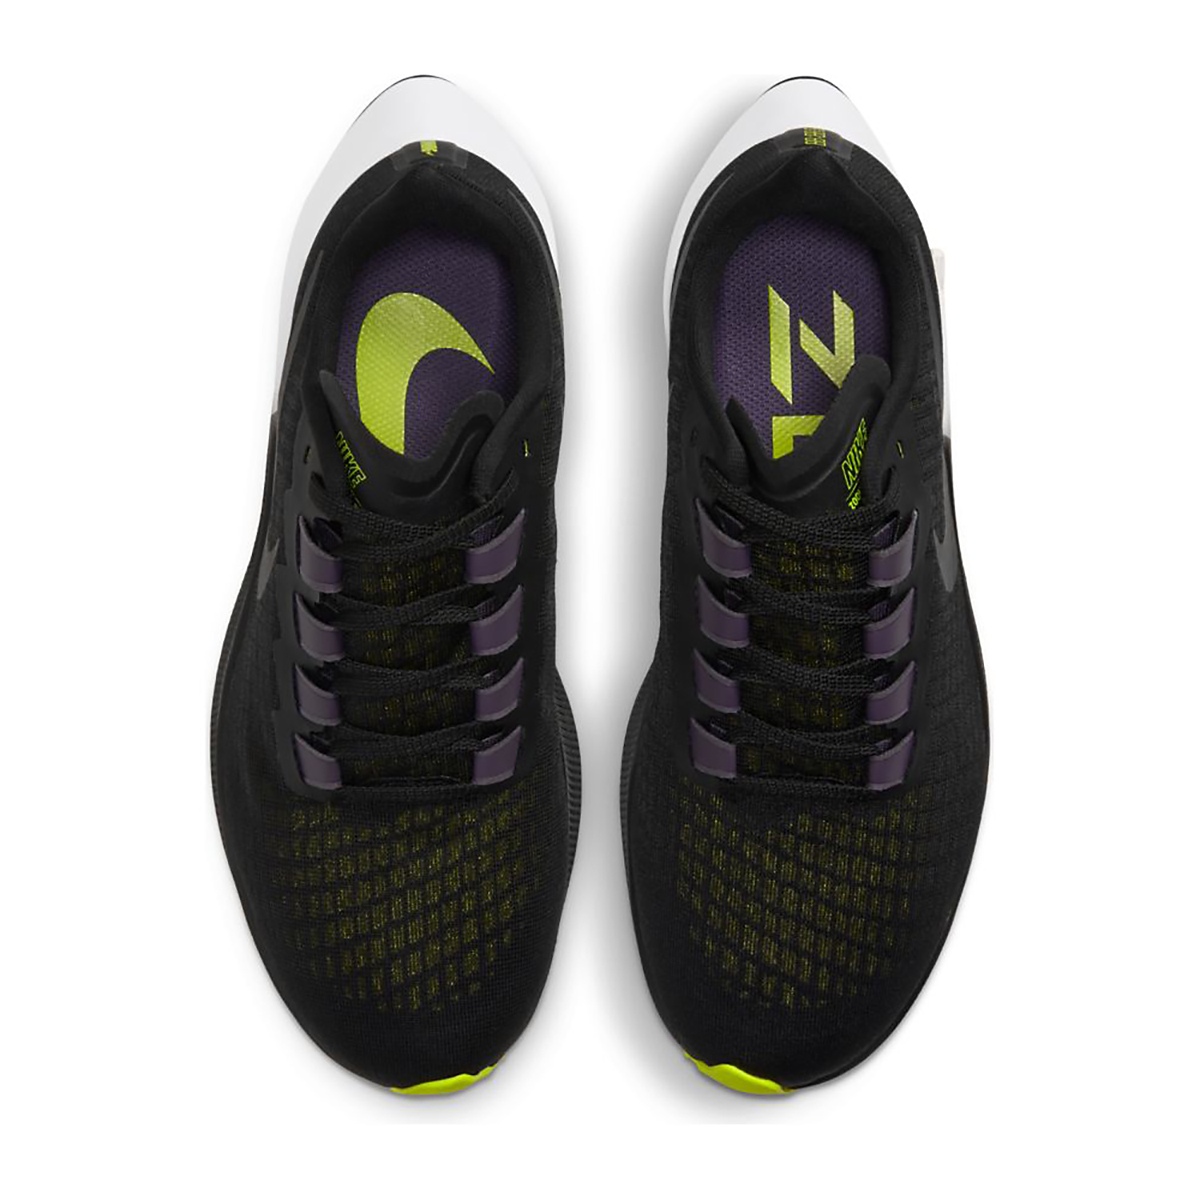 Women's Nike Air Zoom Pegasus 37 Running Shoe - Color: Black/Anthracite/Dark Raisin/White - Size: 5 - Width: Regular, Black/Anthracite/Dark Raisin/White, large, image 6